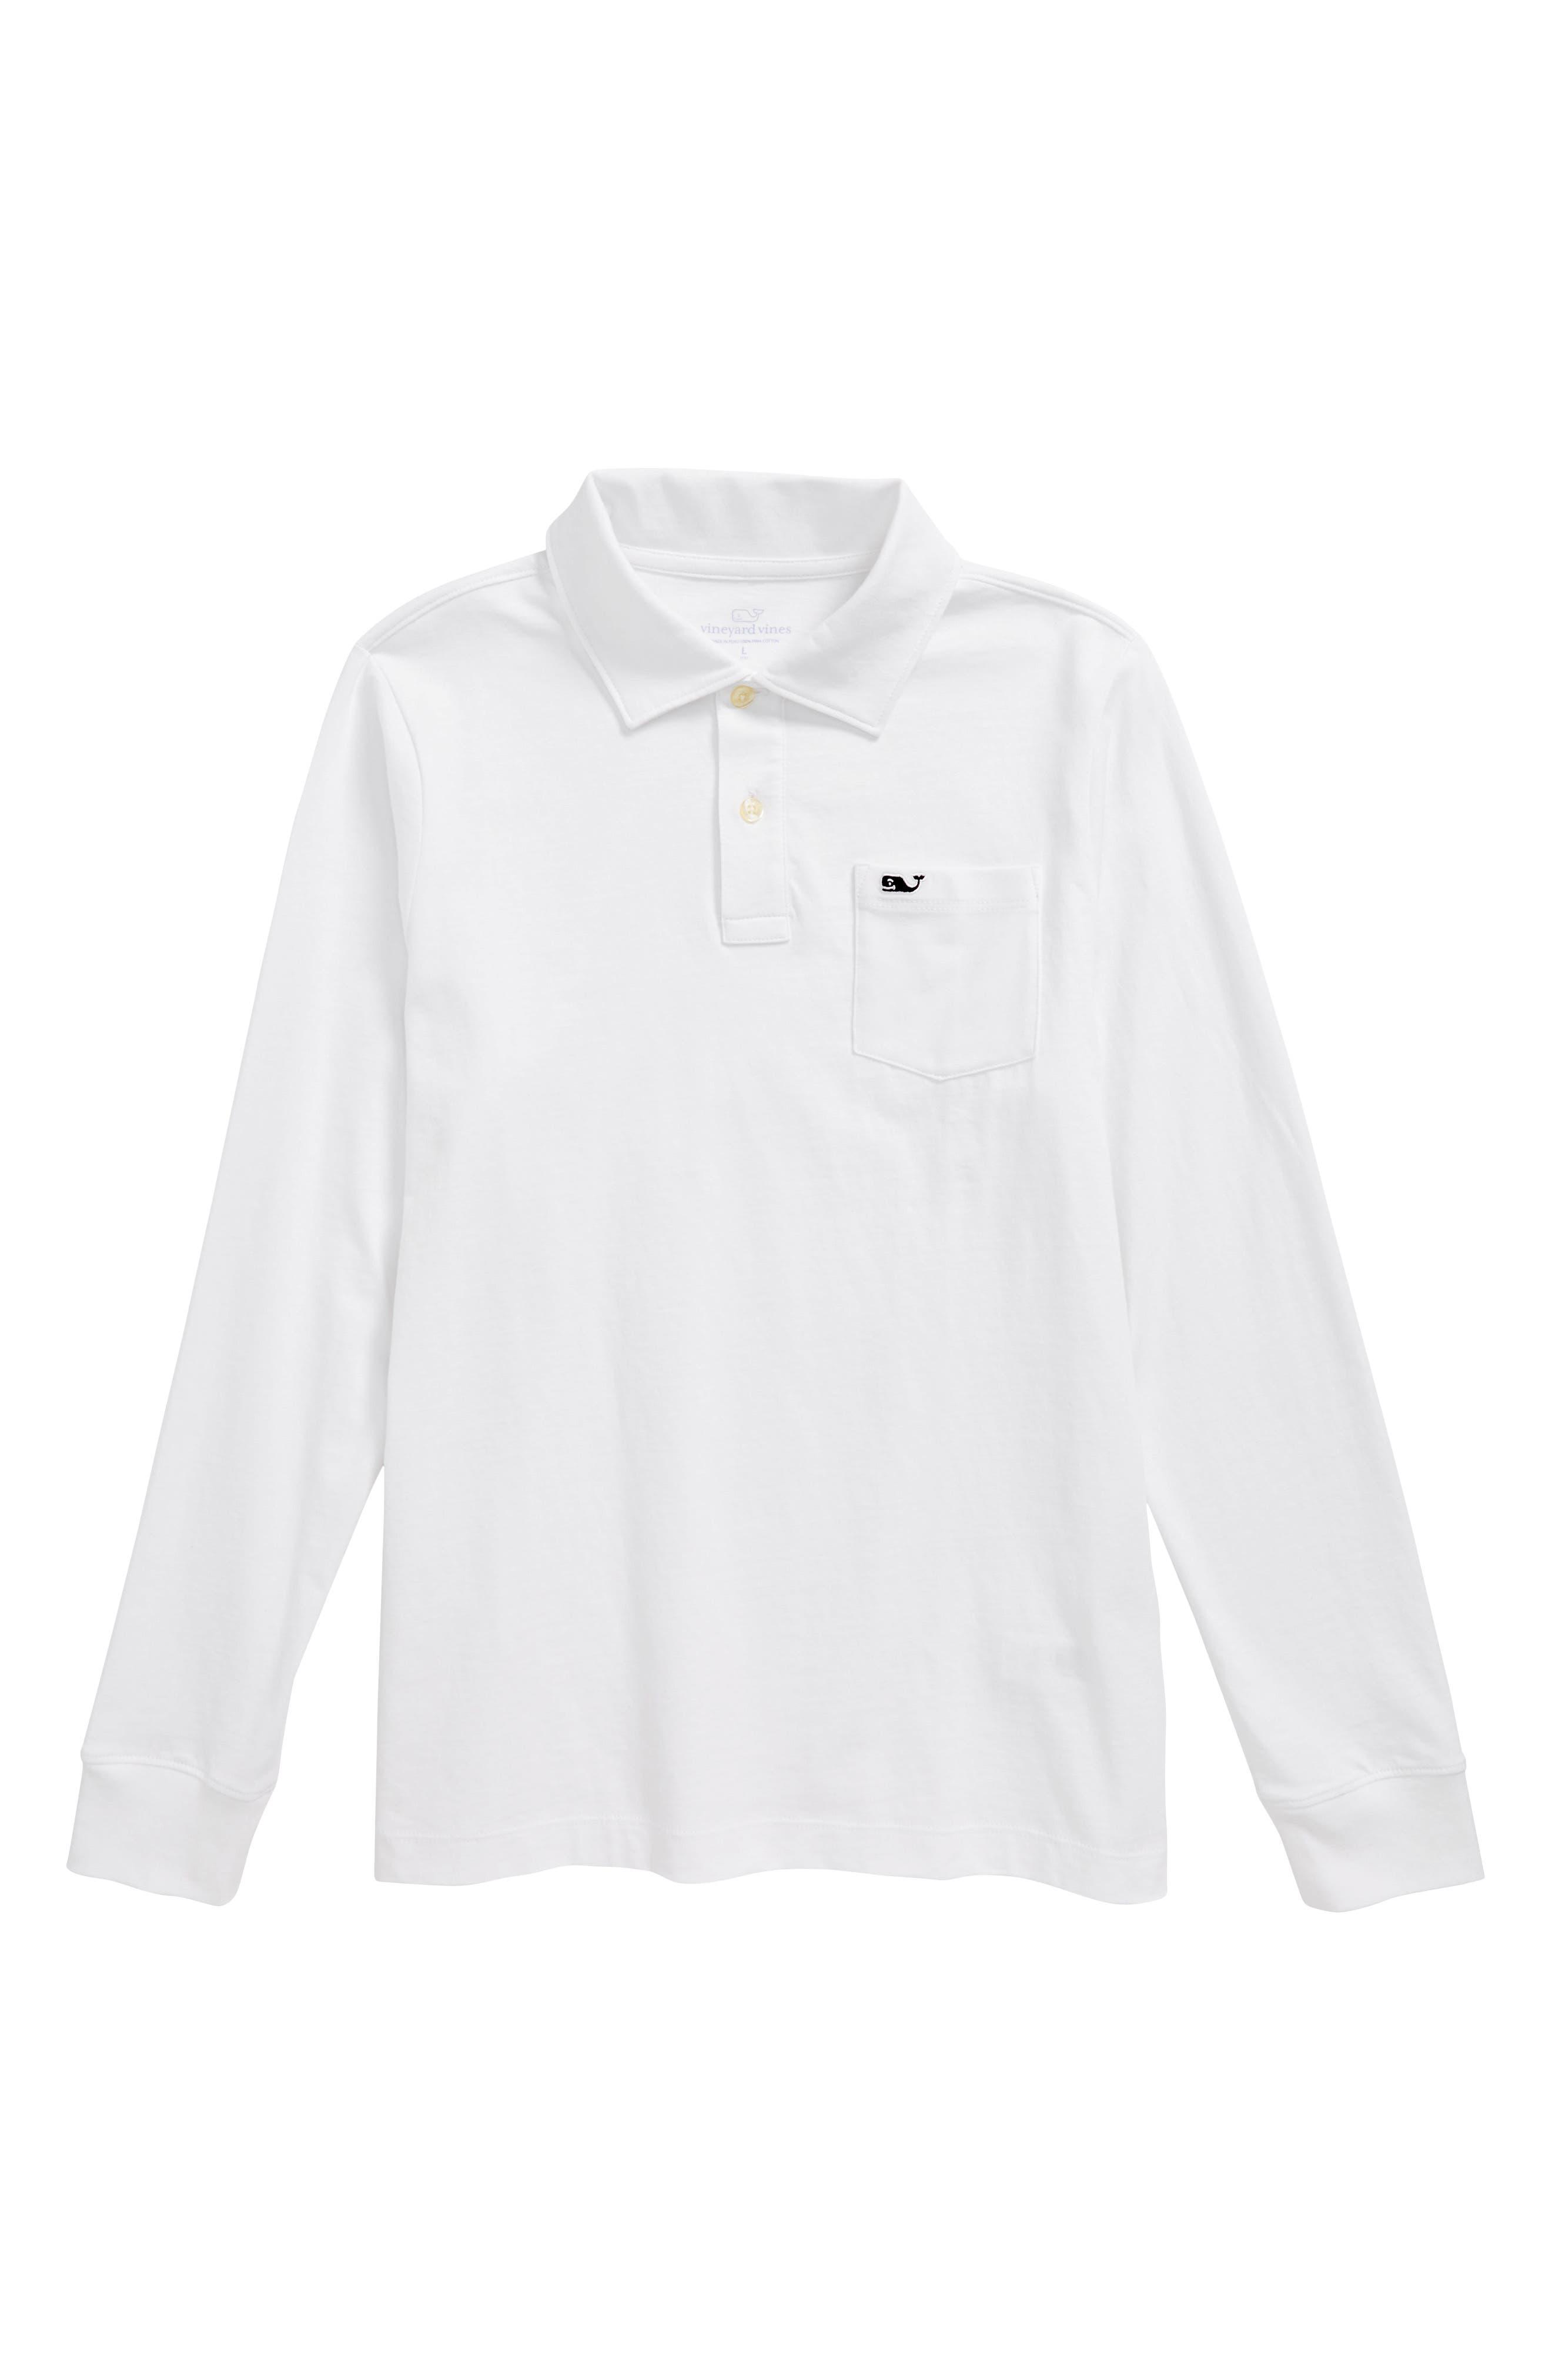 Pima Cotton Jersey Polo,                             Main thumbnail 1, color,                             100